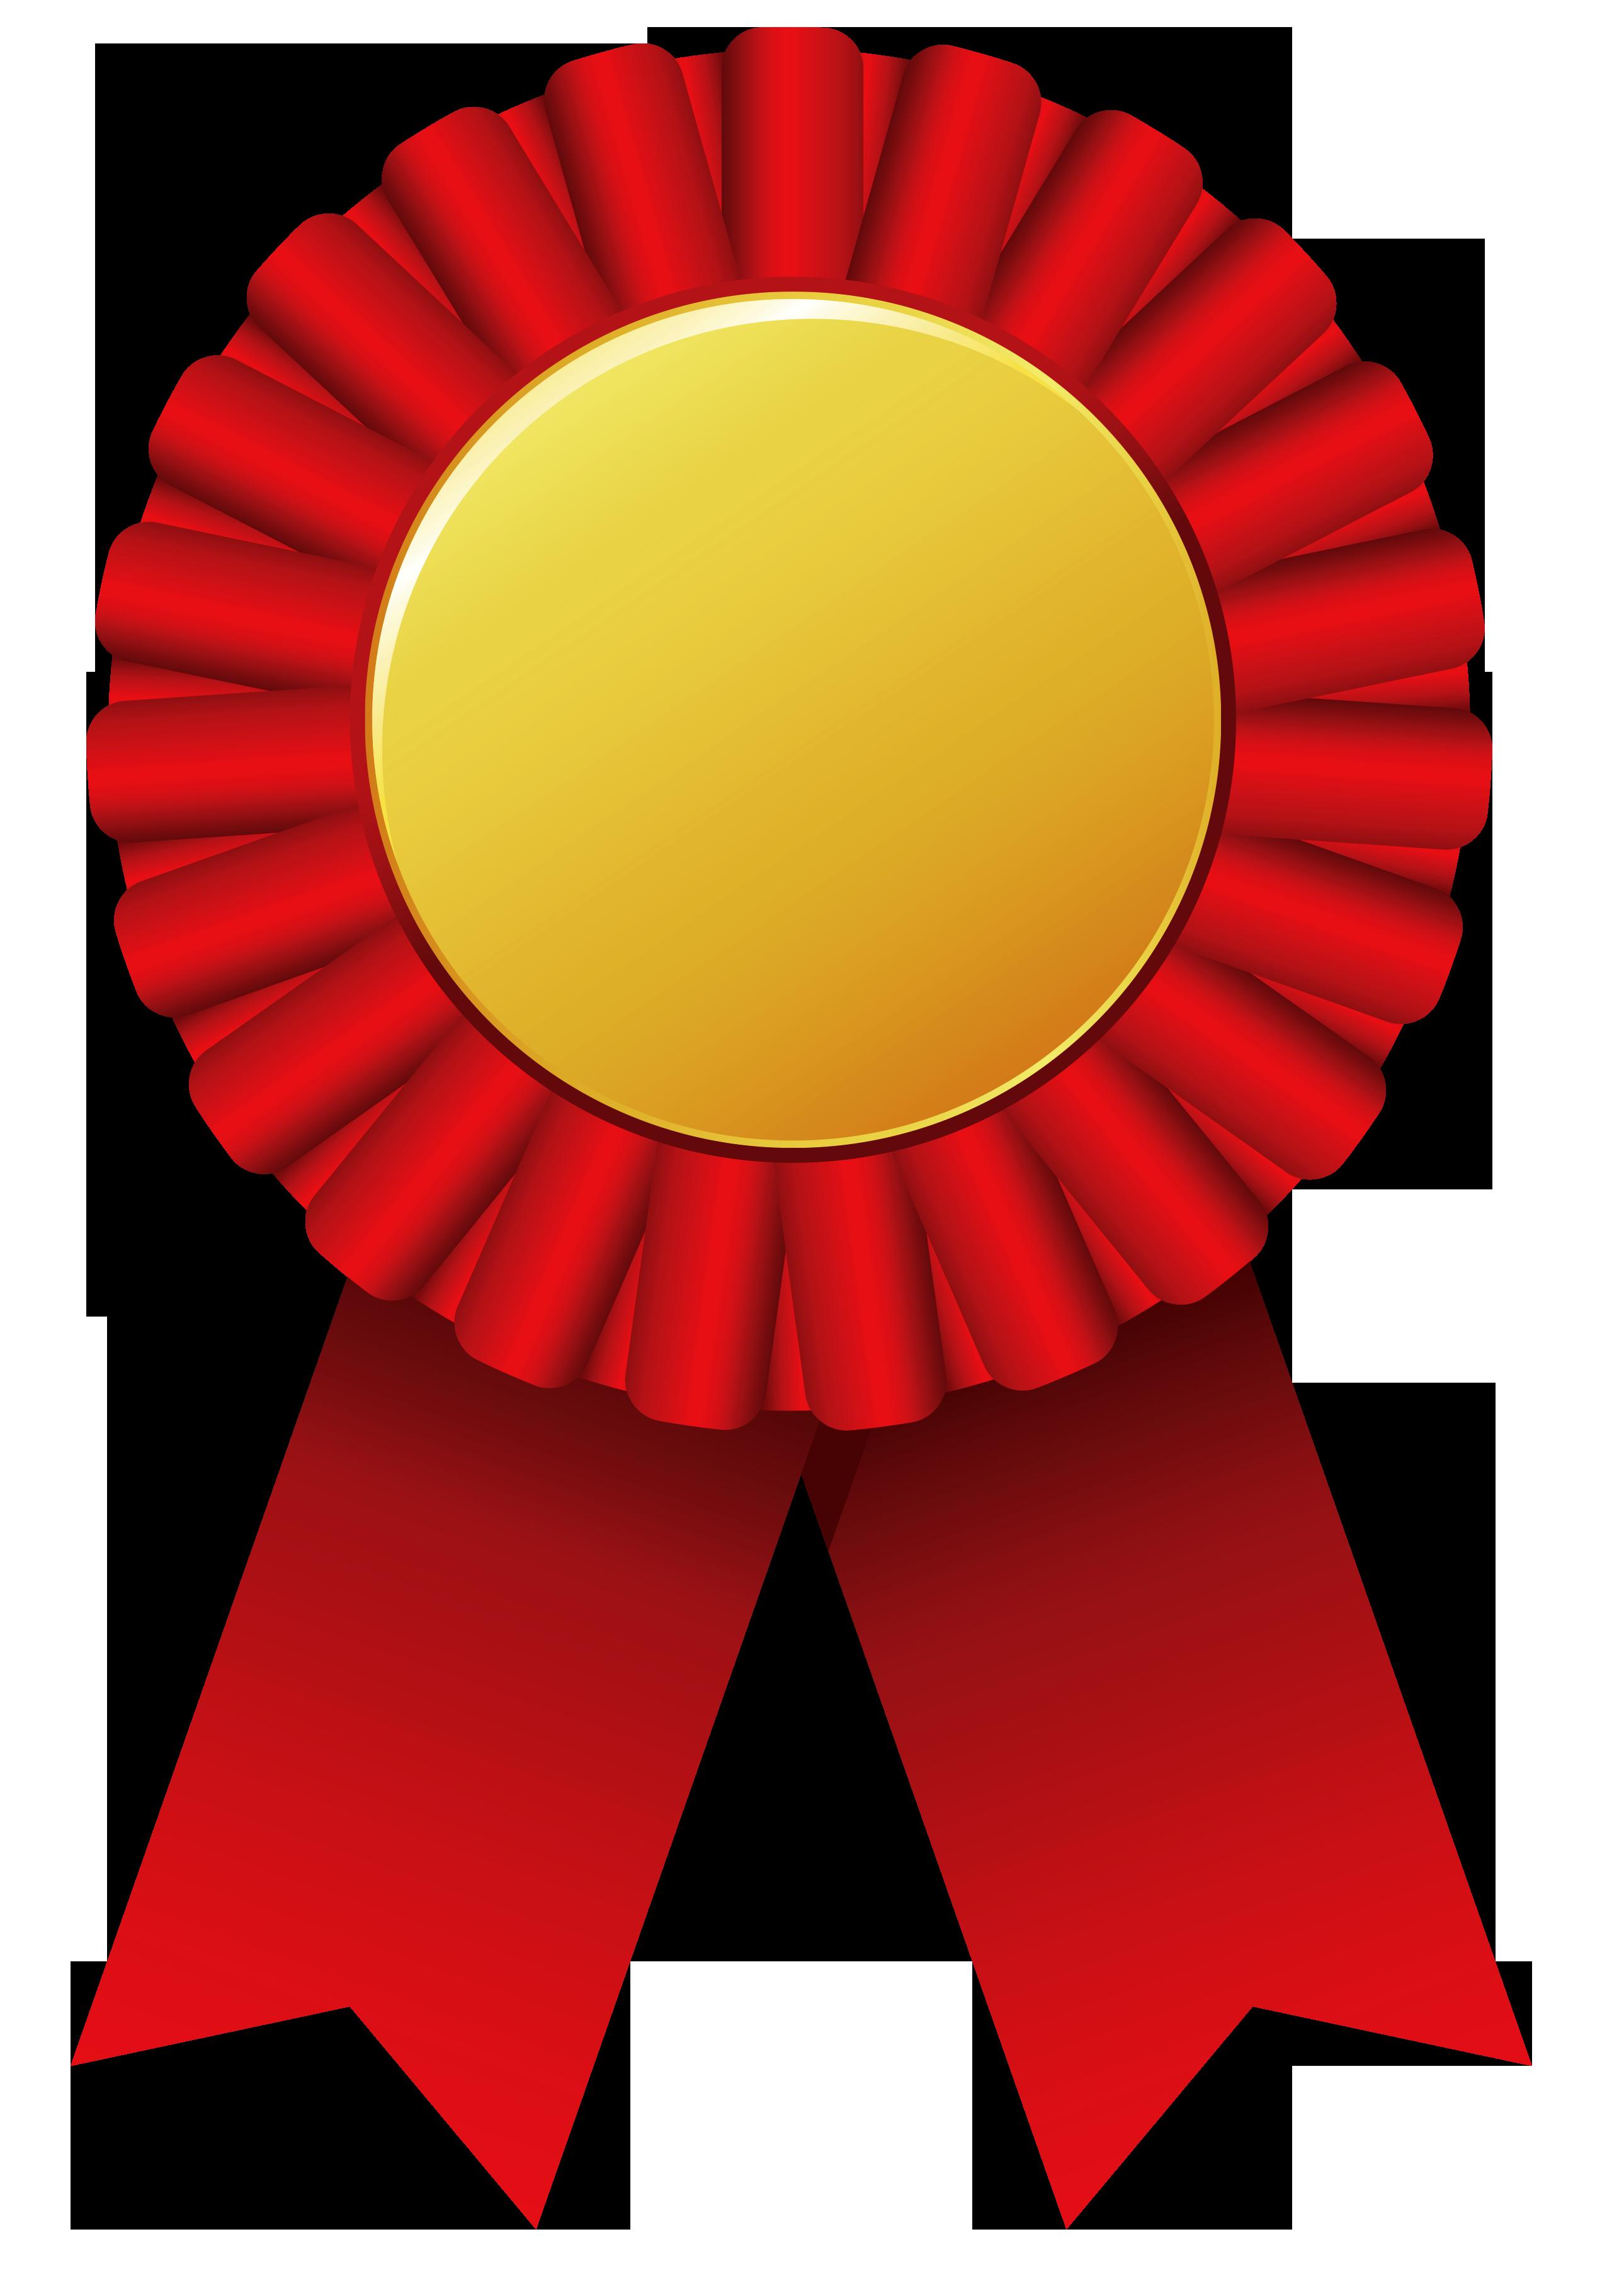 Pin By Shaikh Mushtaq On Your Pinterest Likes Ribbon Png Award Ribbon Ribbon Design